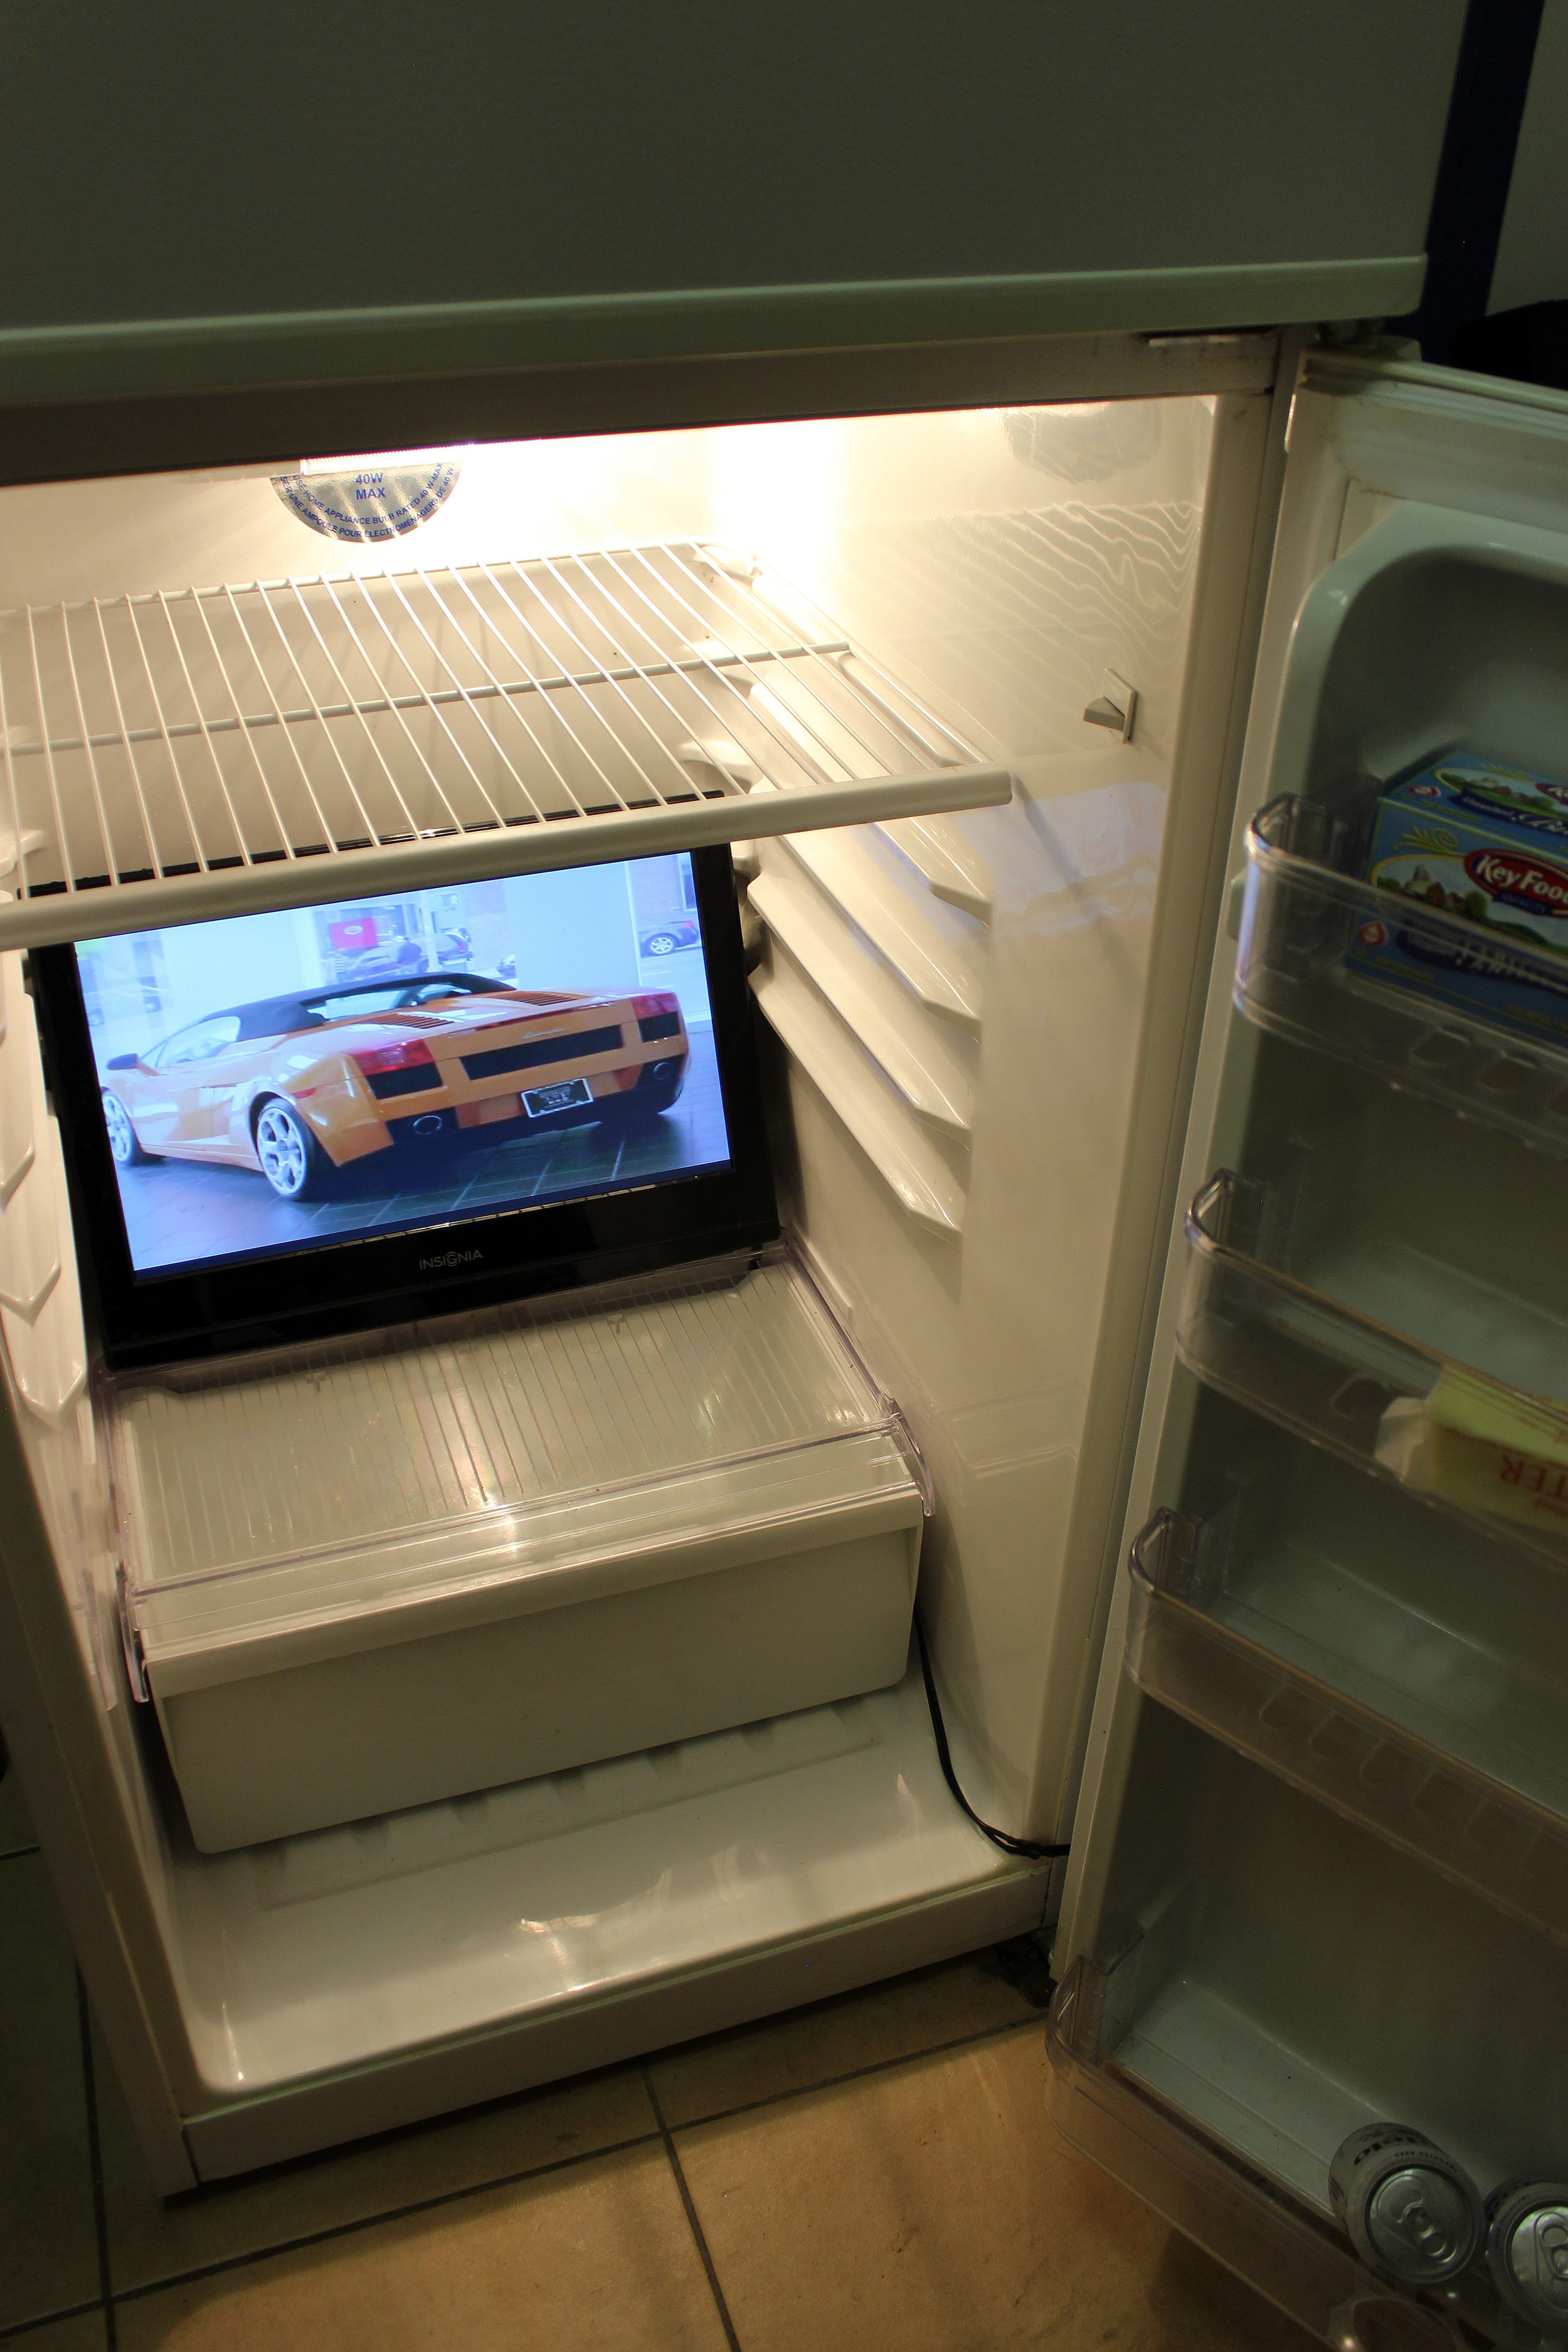 Ben Dowell,  2008 Lamborghini Gallardo (One Mind) , 2008, dvd, monitor, refrigerator, dimensions variable